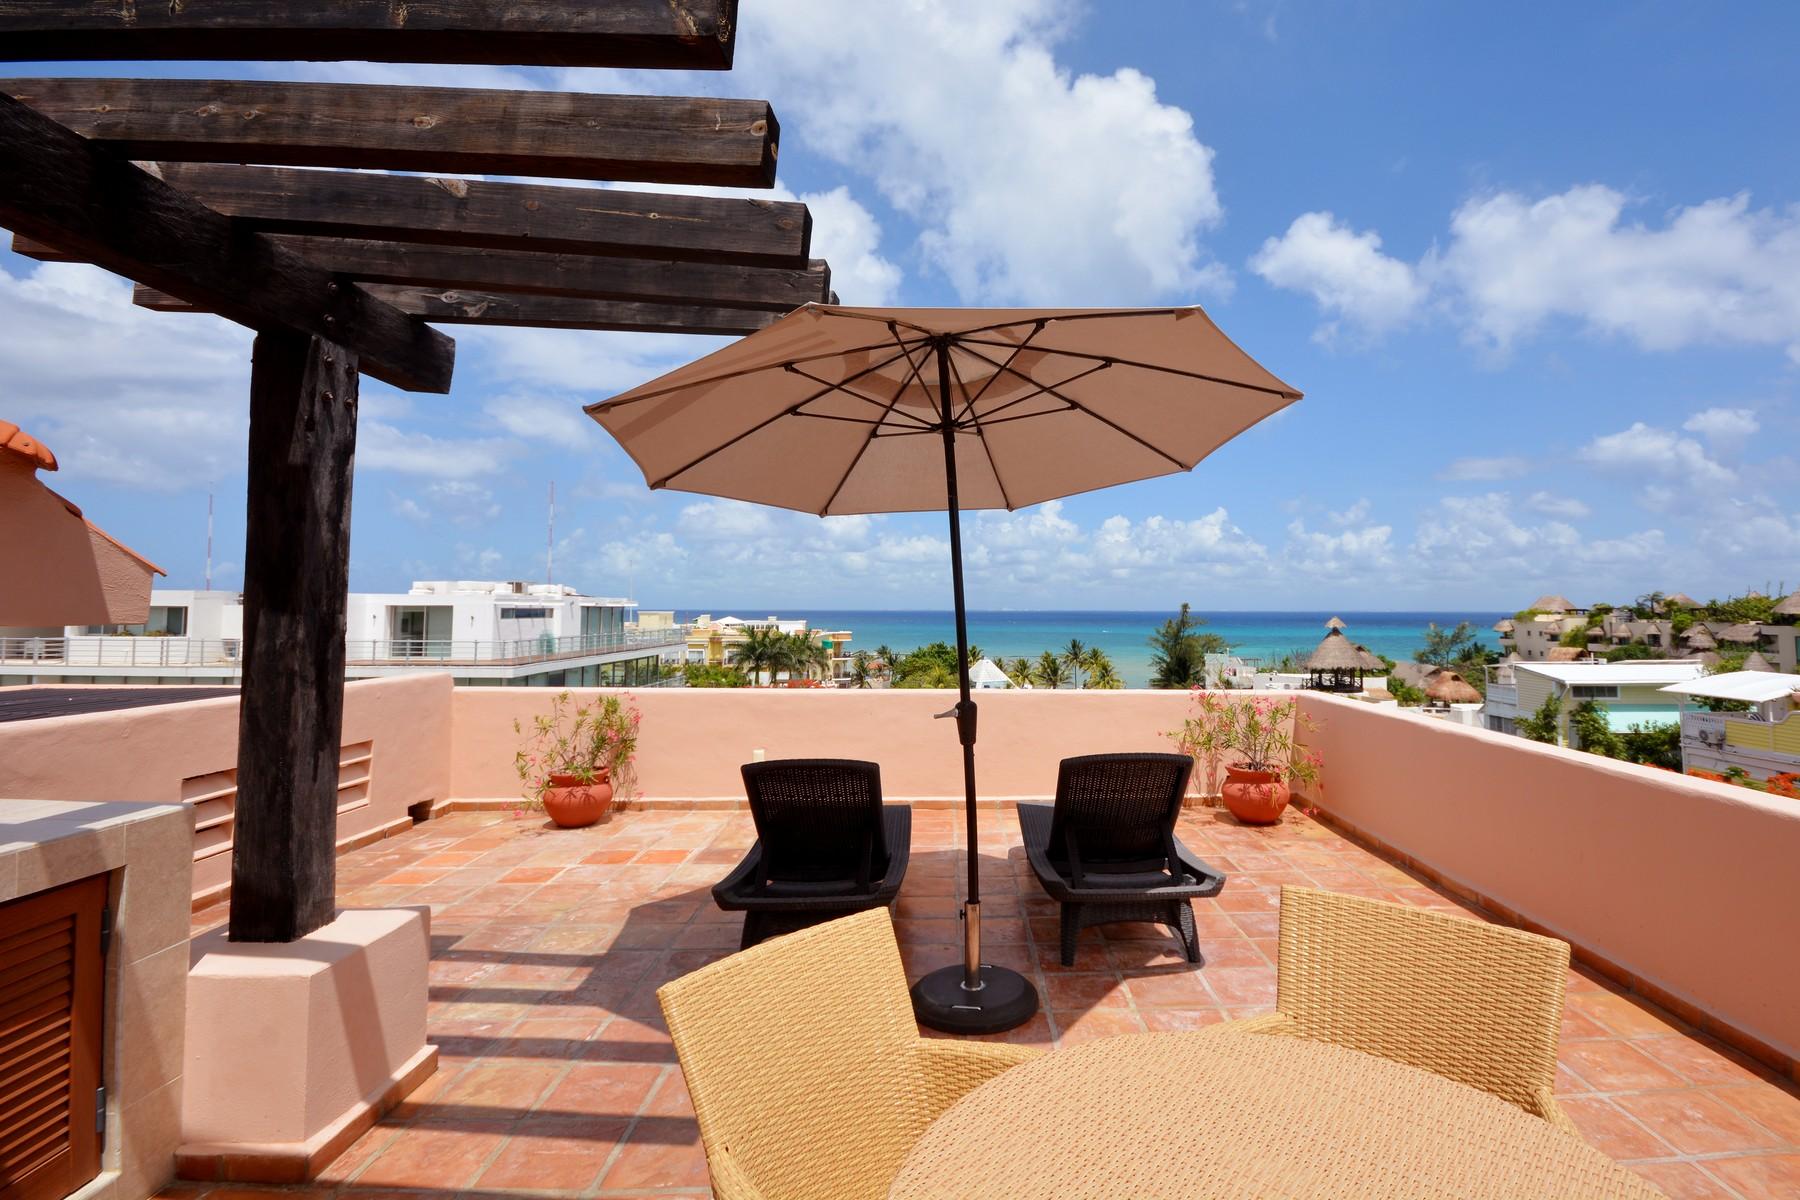 共管物業 為 出售 在 DELUXE PENTHOUSE IN THE BEST LOCATION Deluxe penthouse in the best location Calle 16 Norte Bis entre 5a Ave y 1a Ave Playa Del Carmen, Quintana Roo, 77710 墨西哥